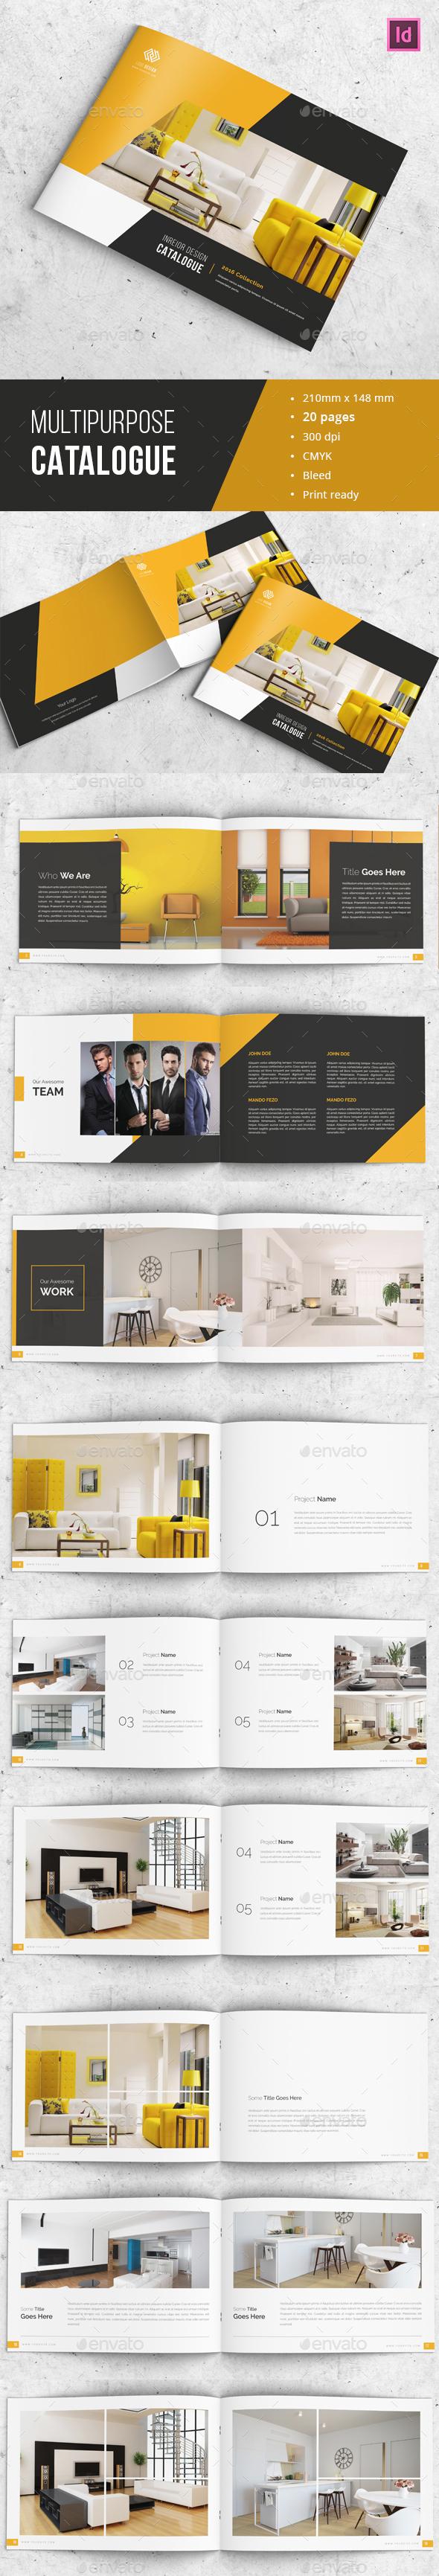 Modern Indesign Catalogue - Catalogs Brochures